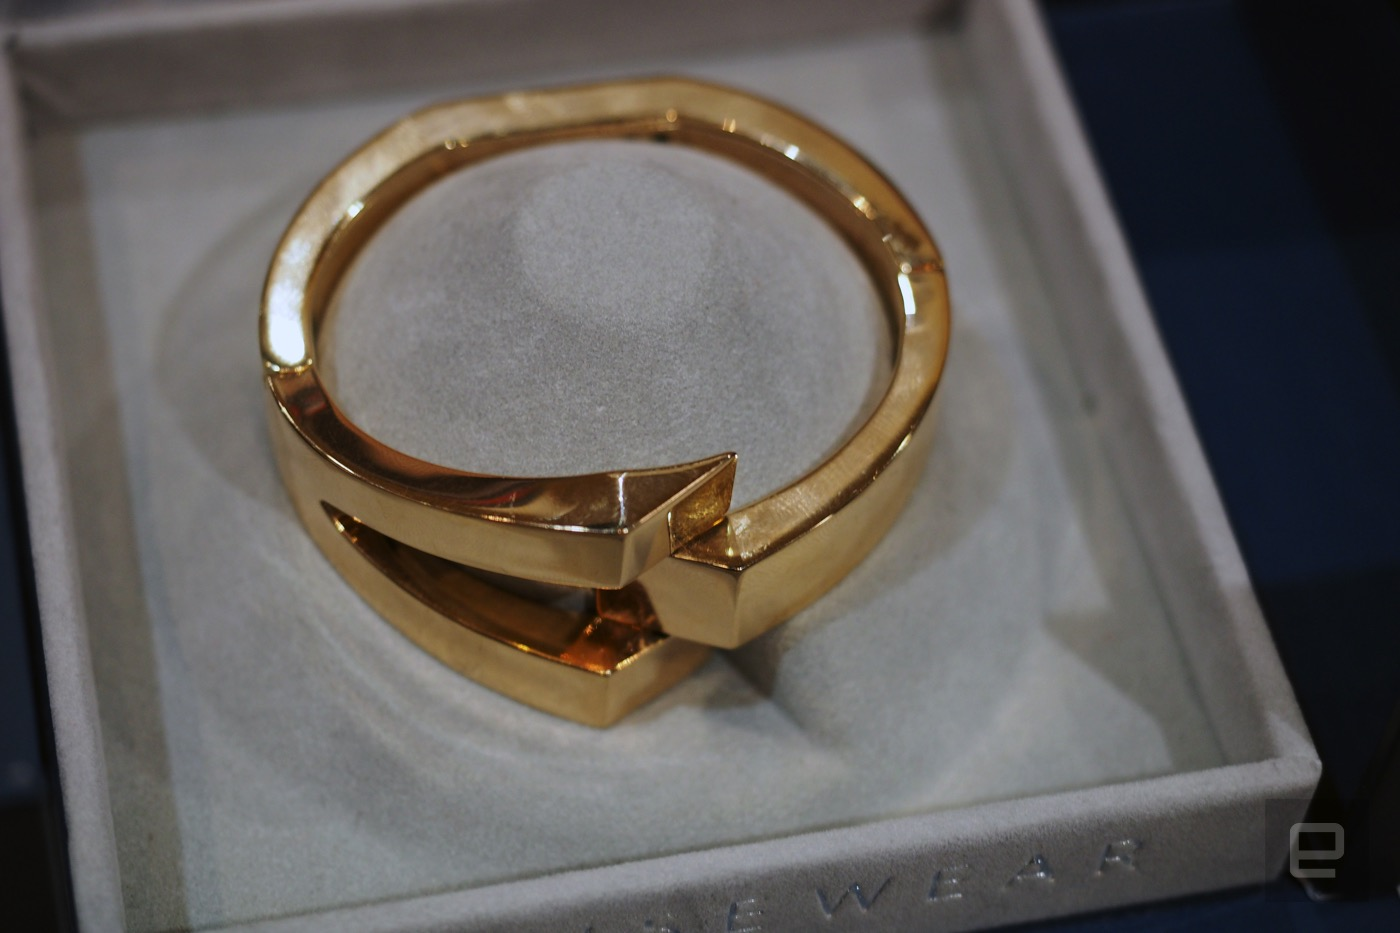 Wisewear hides a safety alarm inside a woman's bracelet